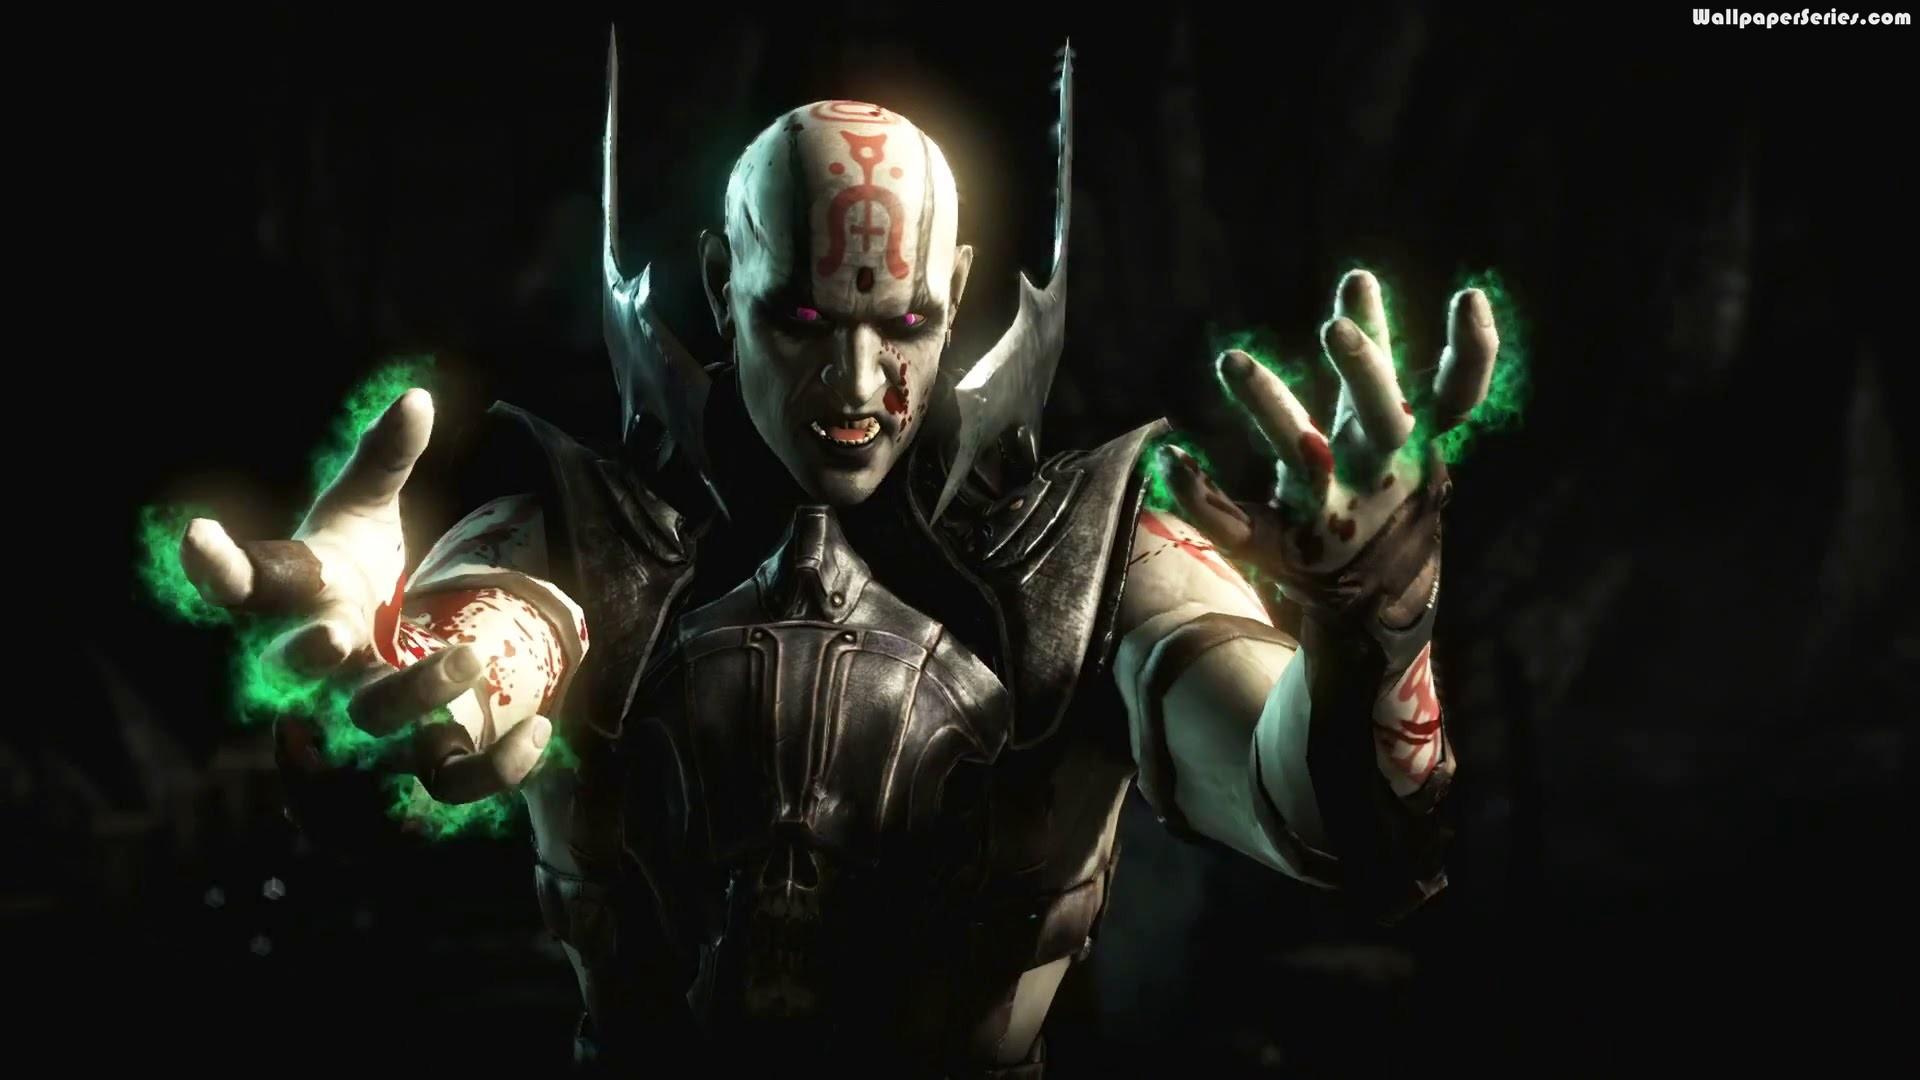 Mortal Kombat X HD Wallpapers for desktop download 1920x1080